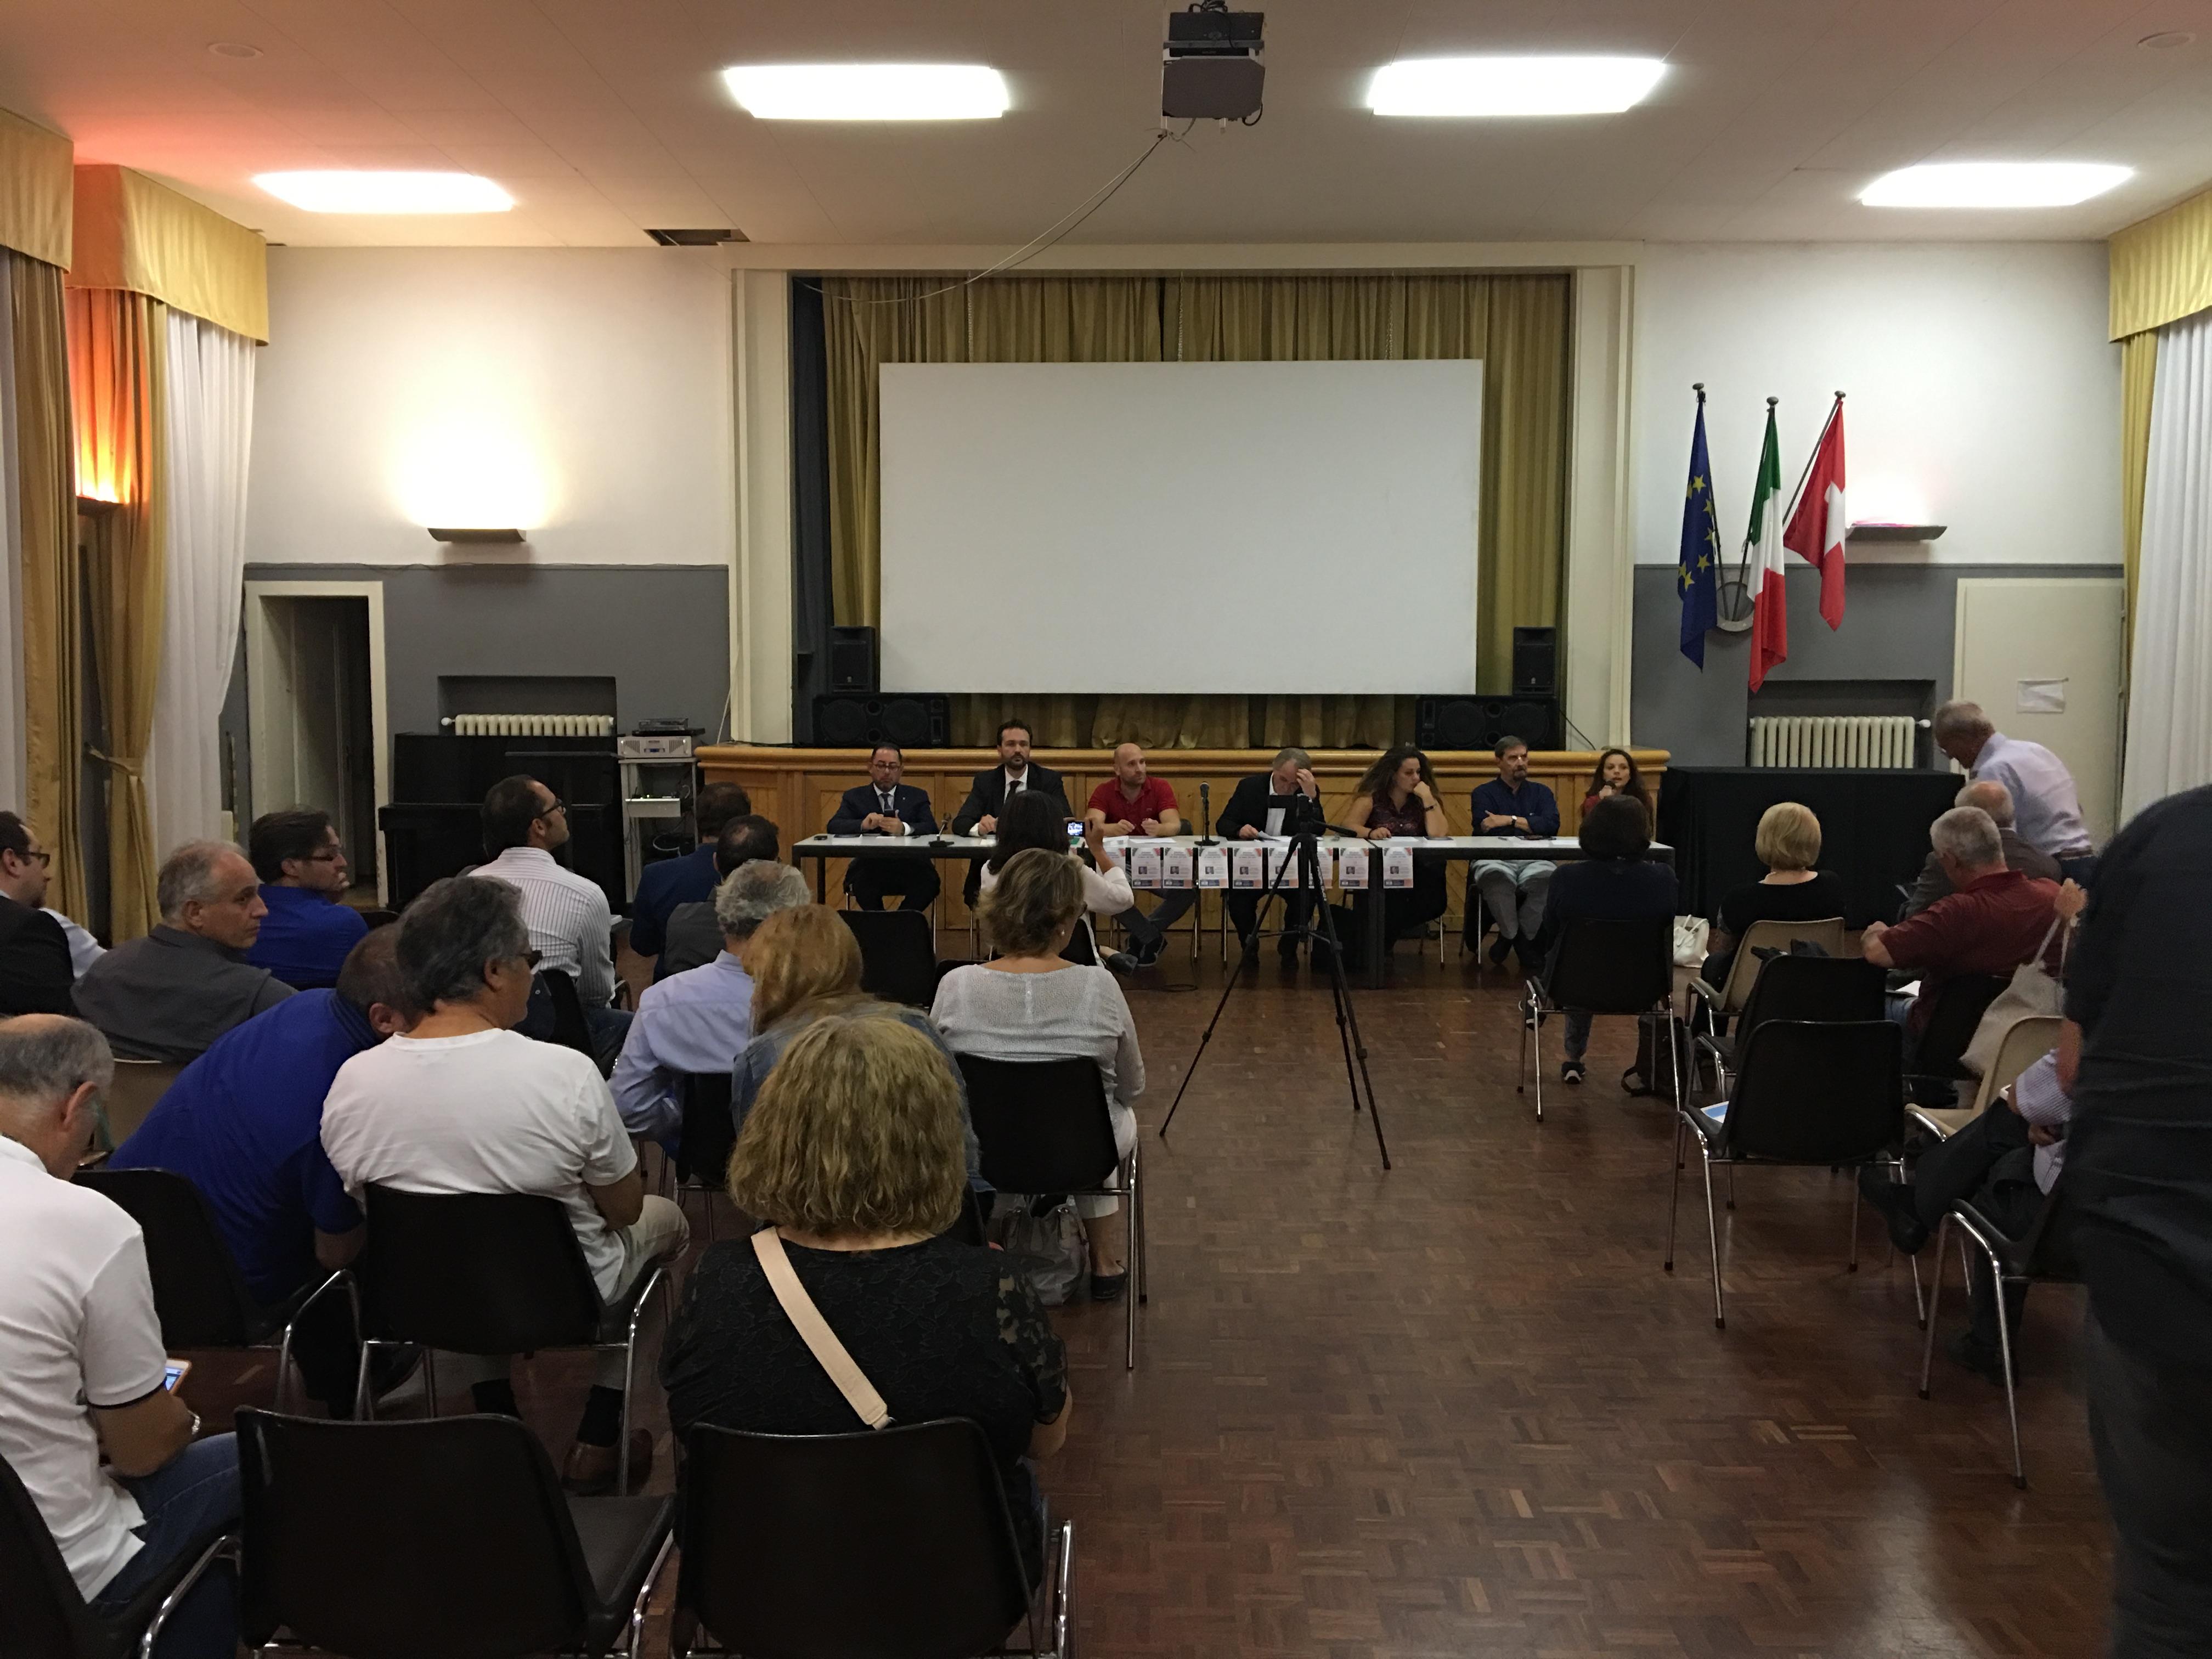 Incontro su referendum riforma costituzionale - Zurigo